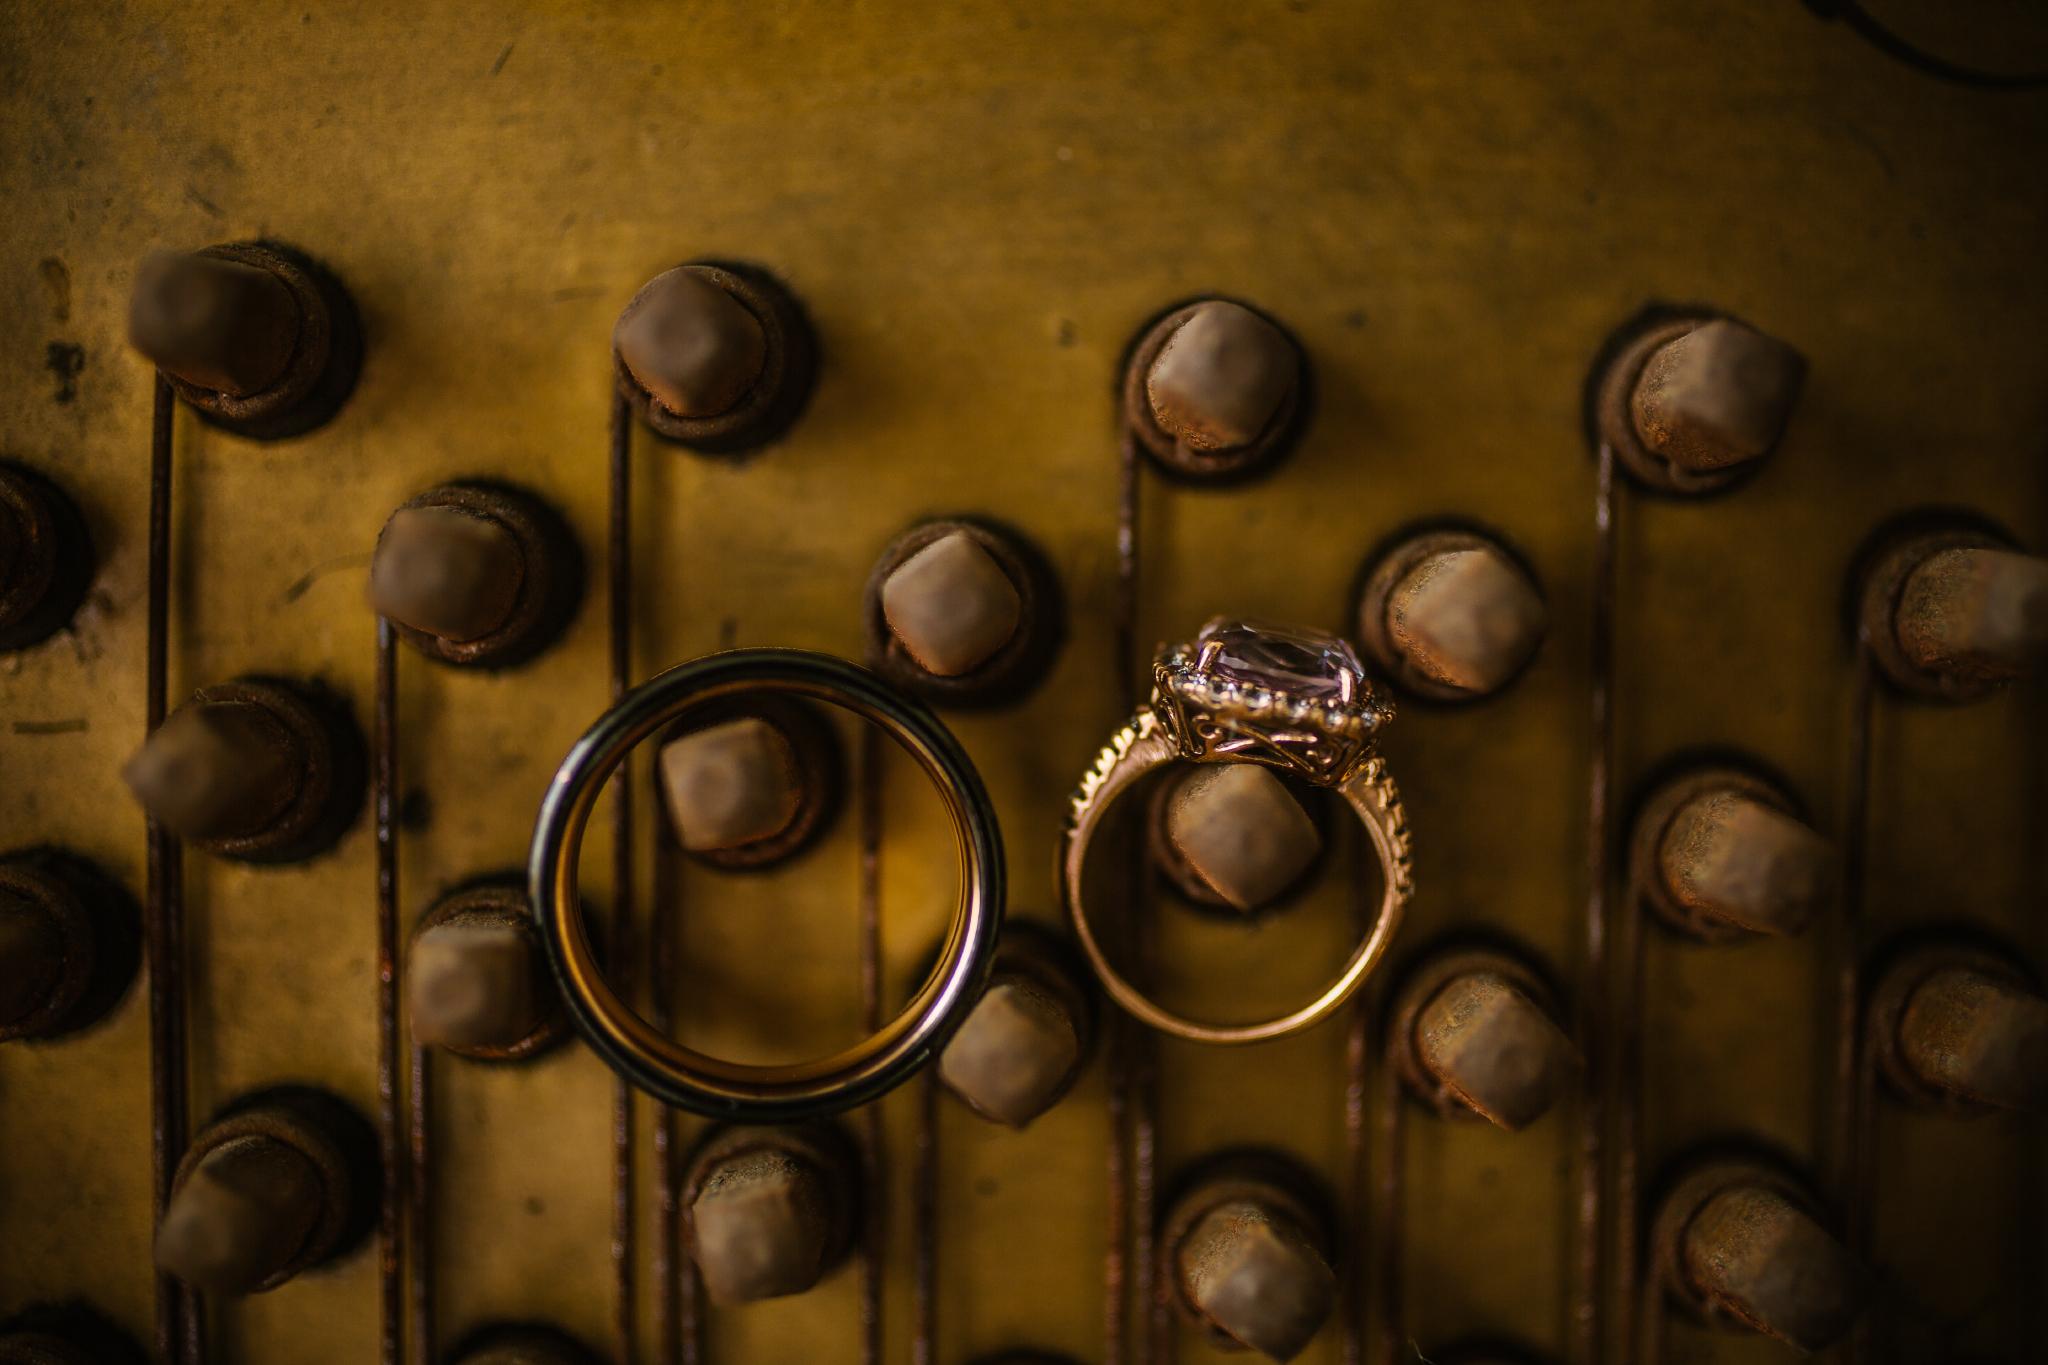 san diego wedding   photographer   rings on a wall